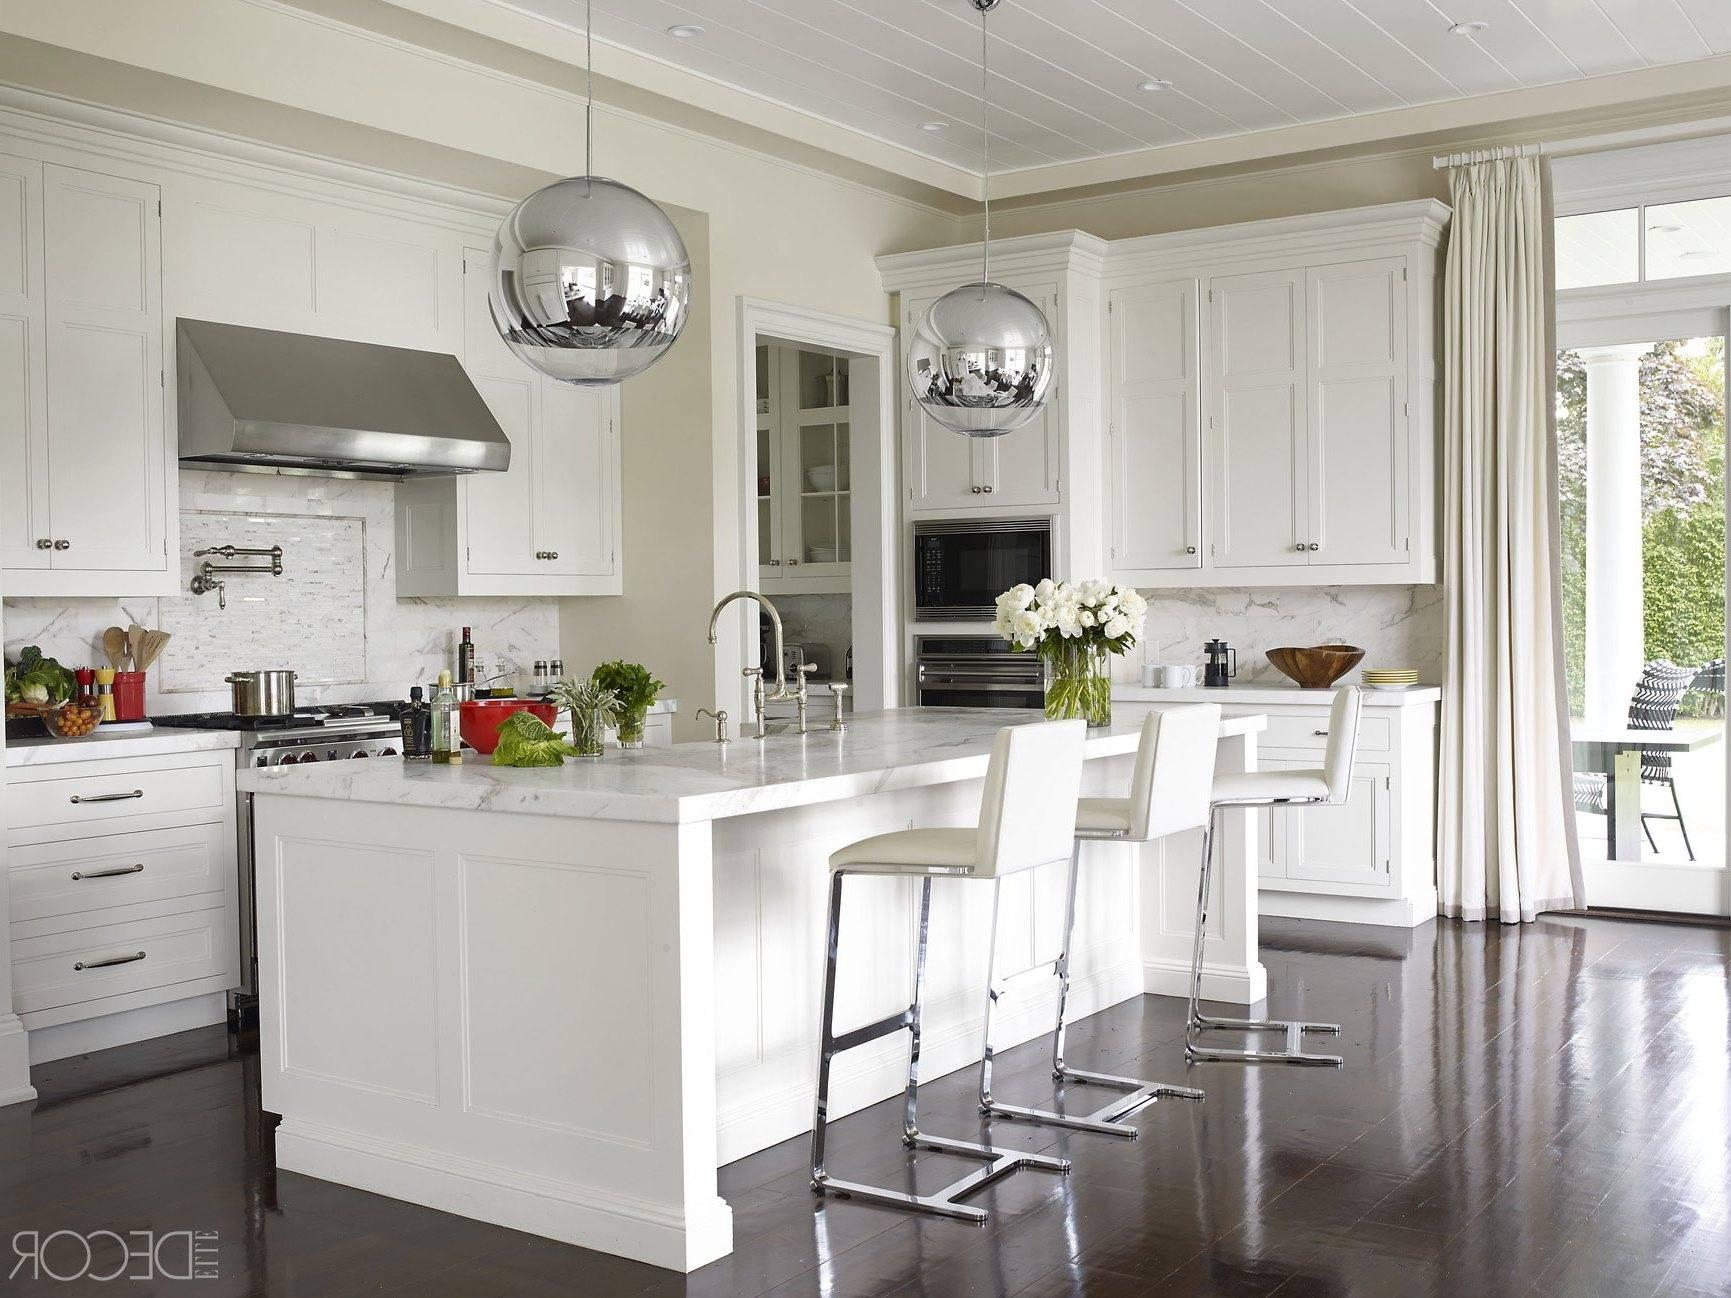 Kitchen Pendant Lighting Over Sink Floor Ceramic Double Oven Range within Stainless Steel Kitchen Pendant Lights (Image 7 of 15)